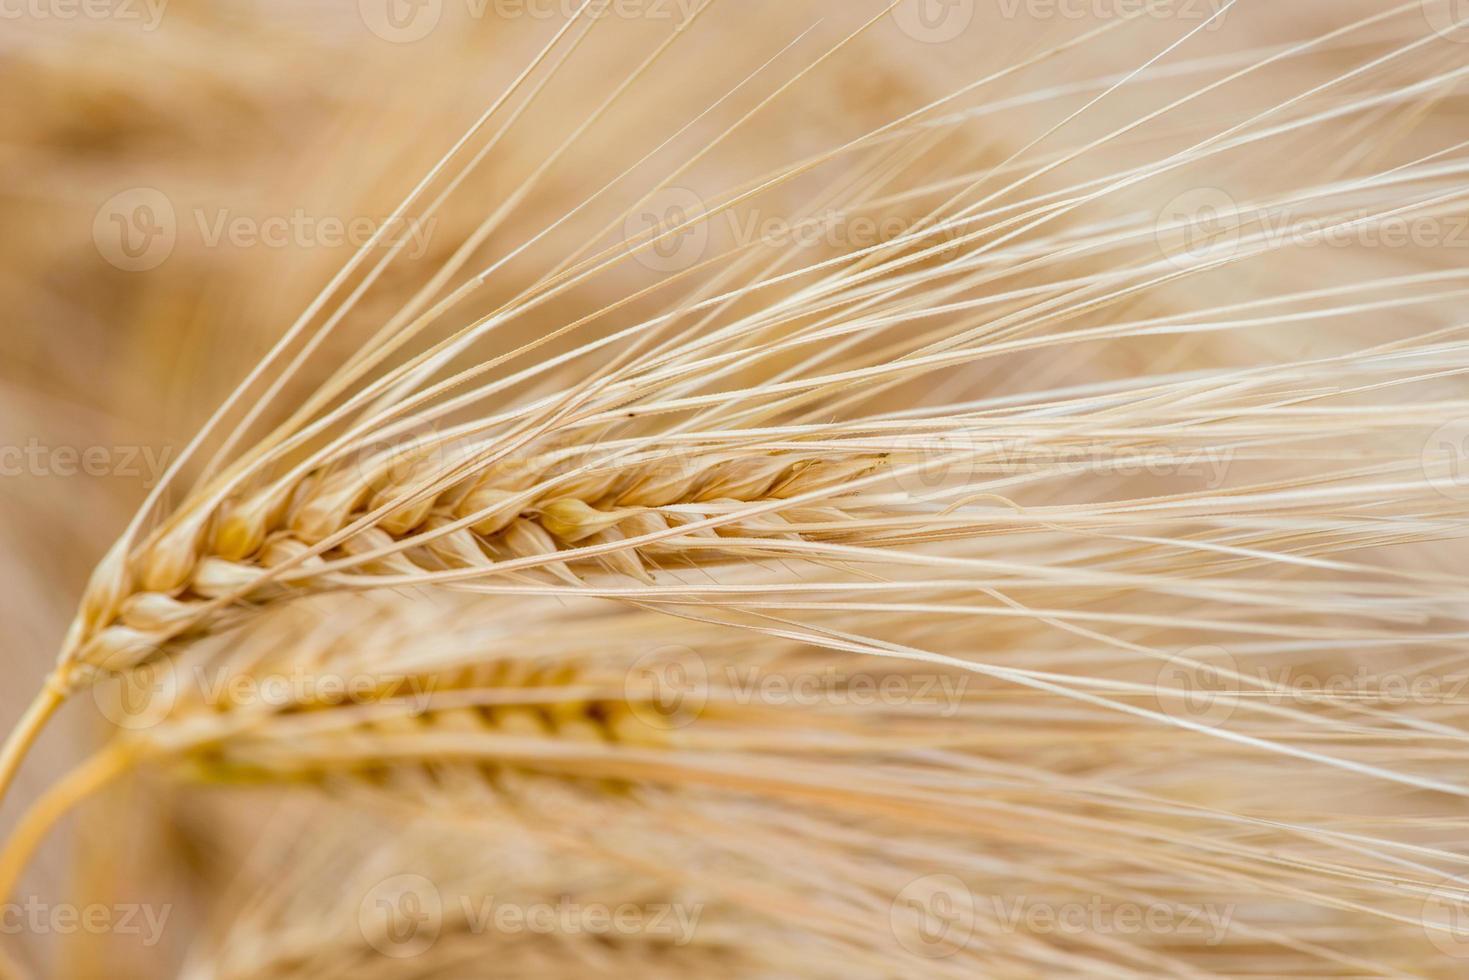 plantas de cereais, cevada, com foco diferente foto